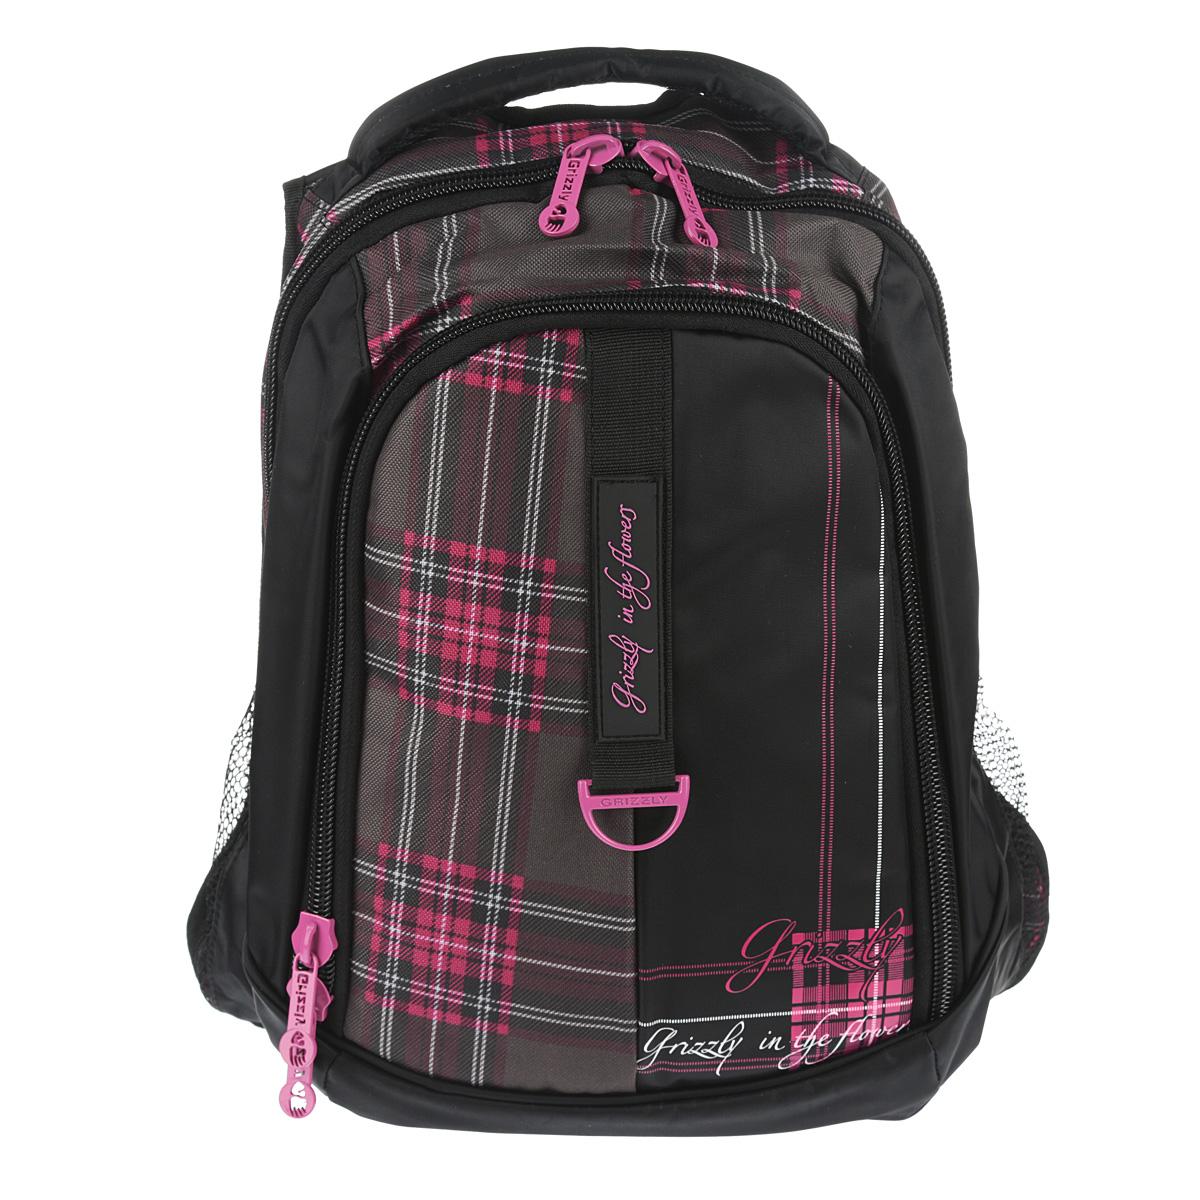 Рюкзак городской Grizzly, цвет: клетка фуксия, 24 л. RD-521-1/6 цена